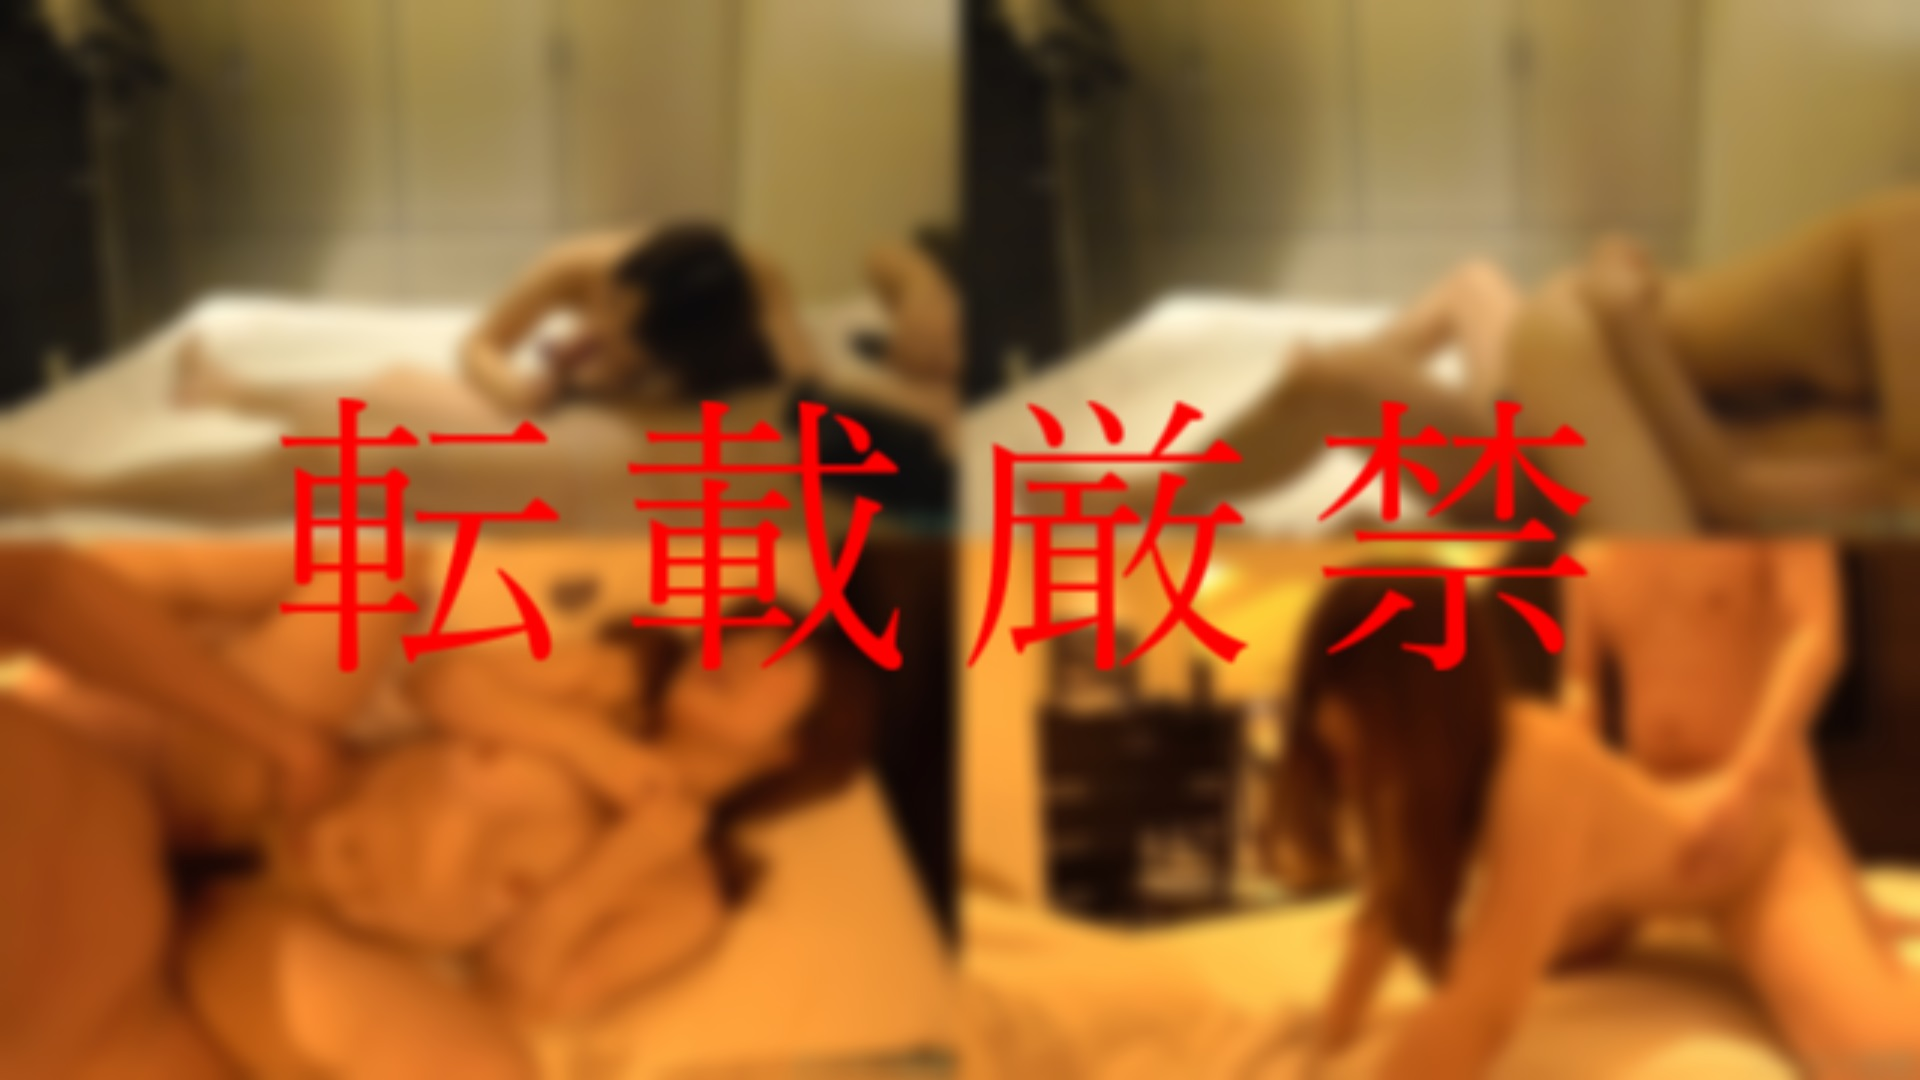 001_mai_01 (3).jpg